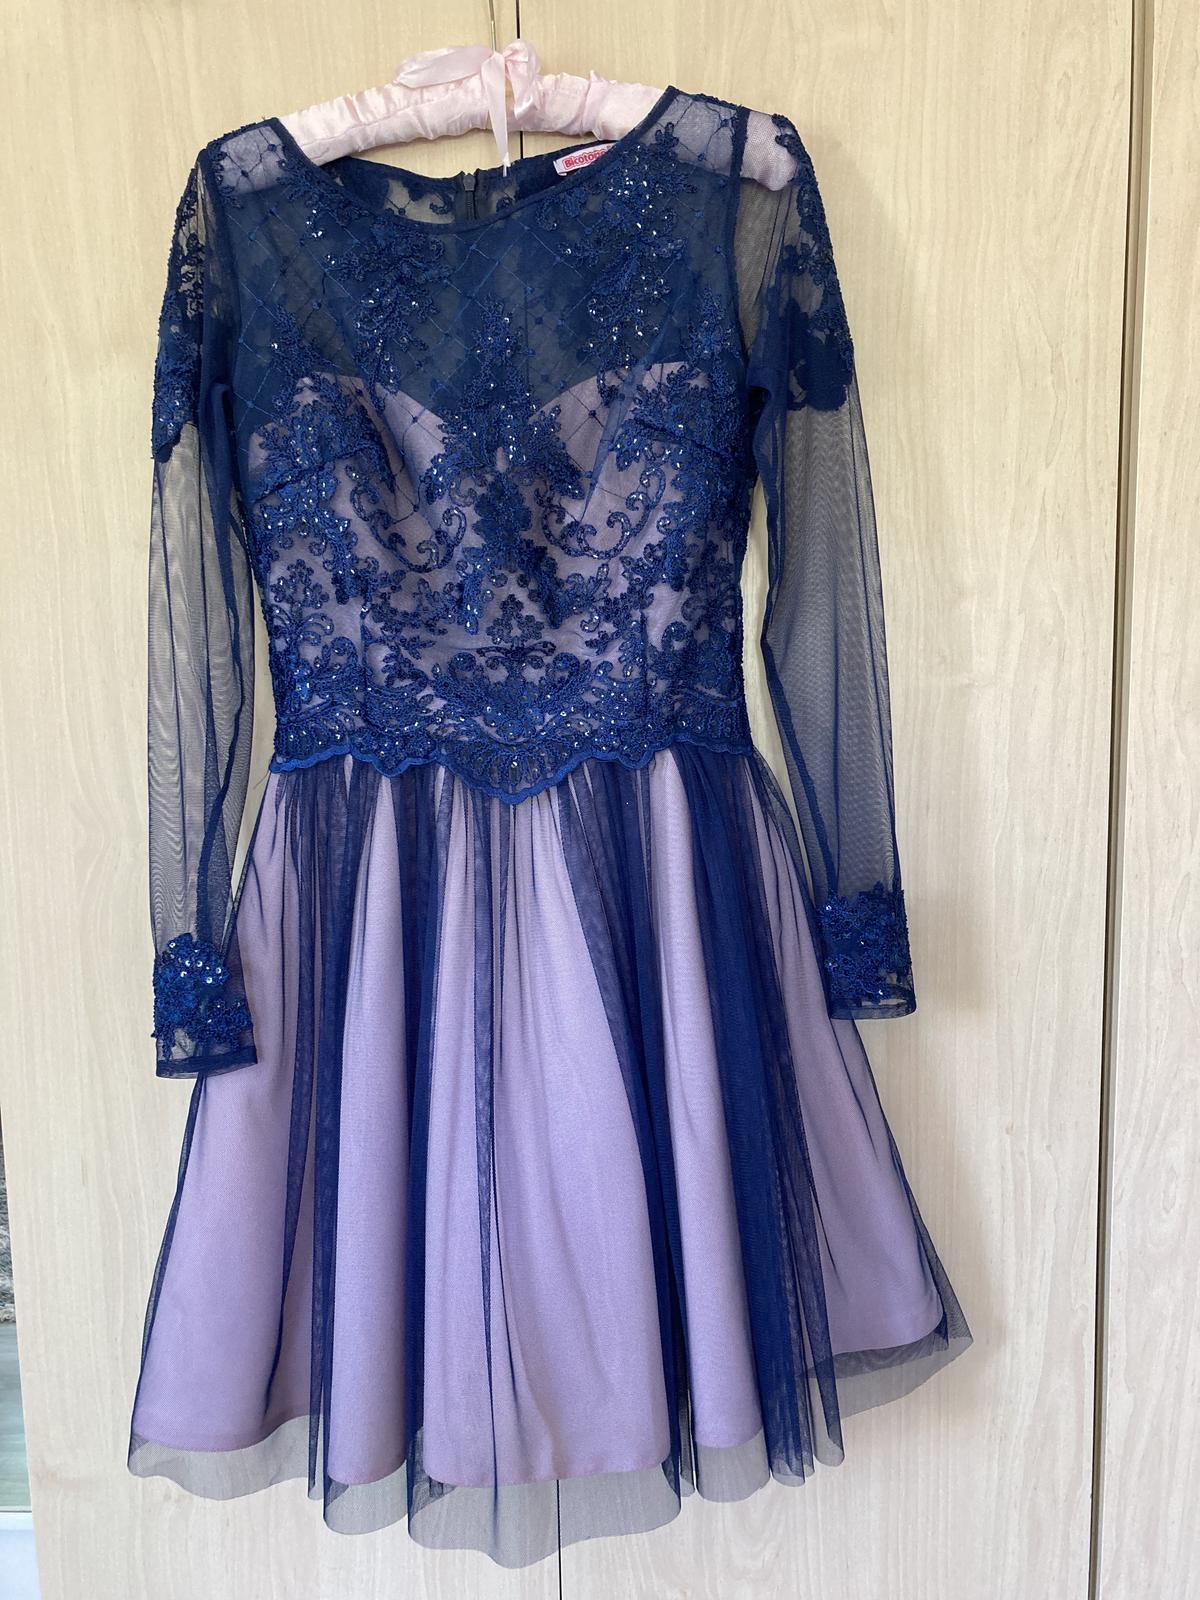 Elegantne šaty 36 - Obrázok č. 1